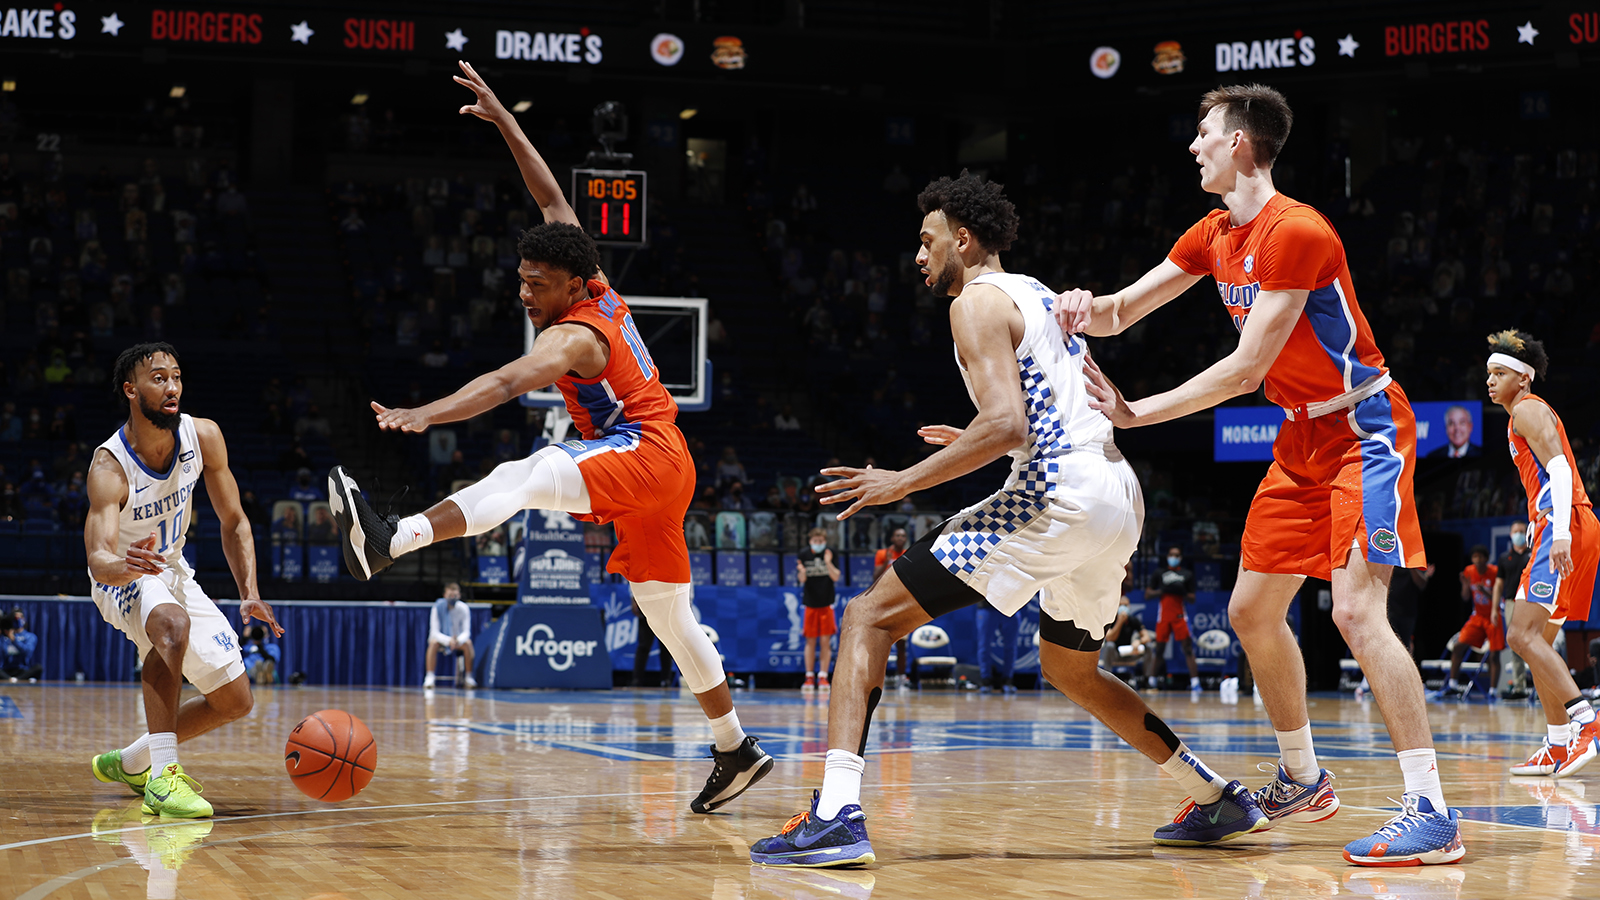 Basketball athletics brooks-pr md 3